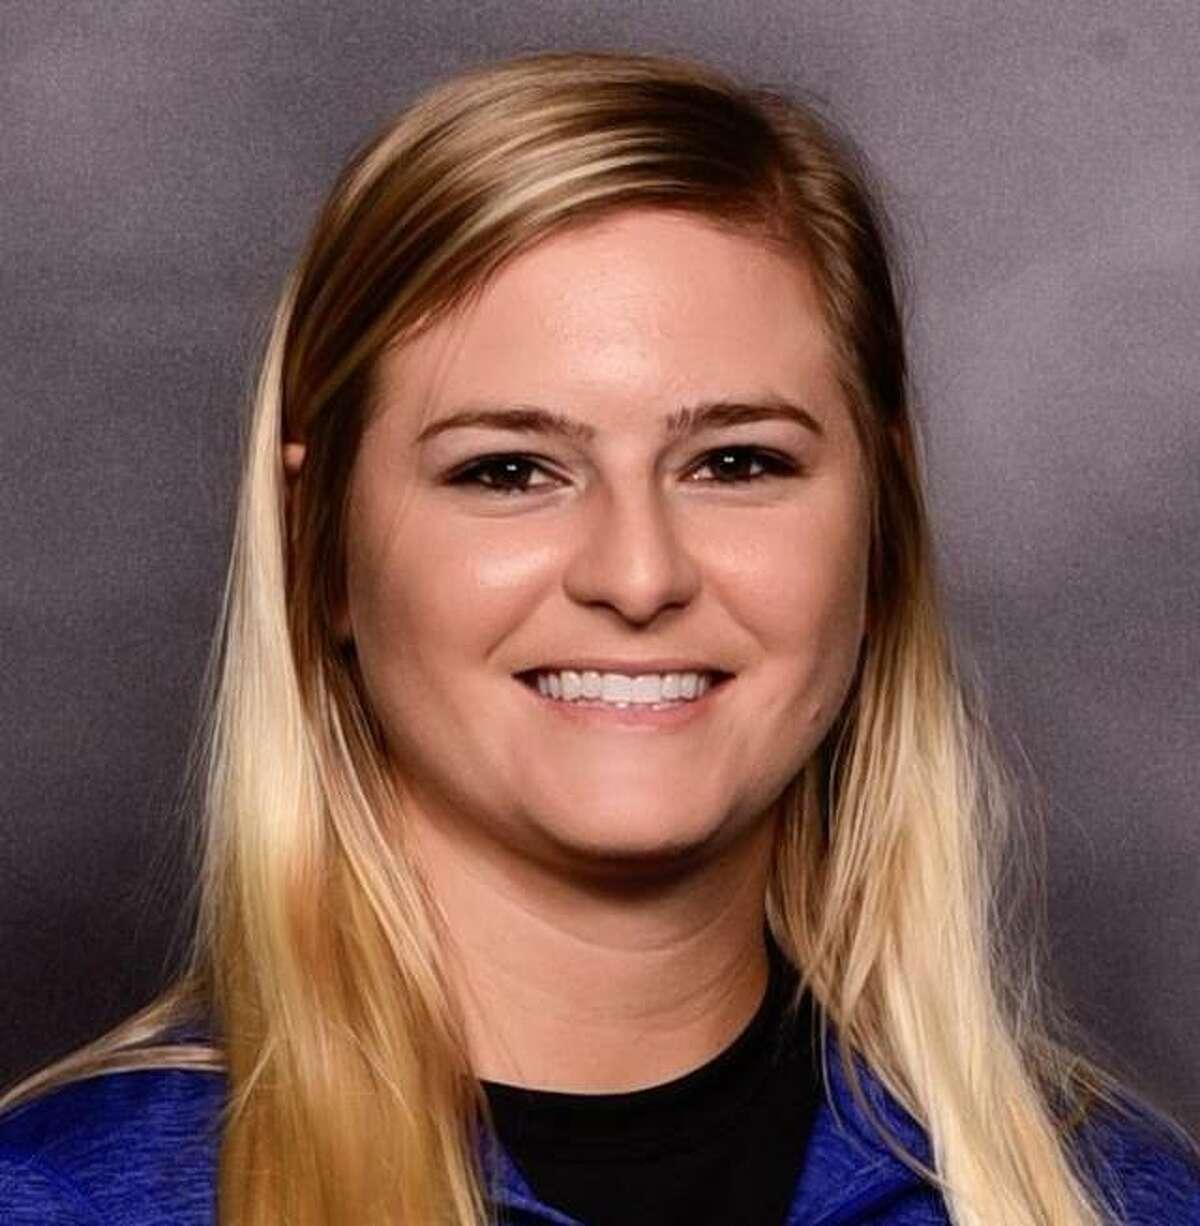 Alyssa Maynard is the new girls soccer coach at Willis High School.